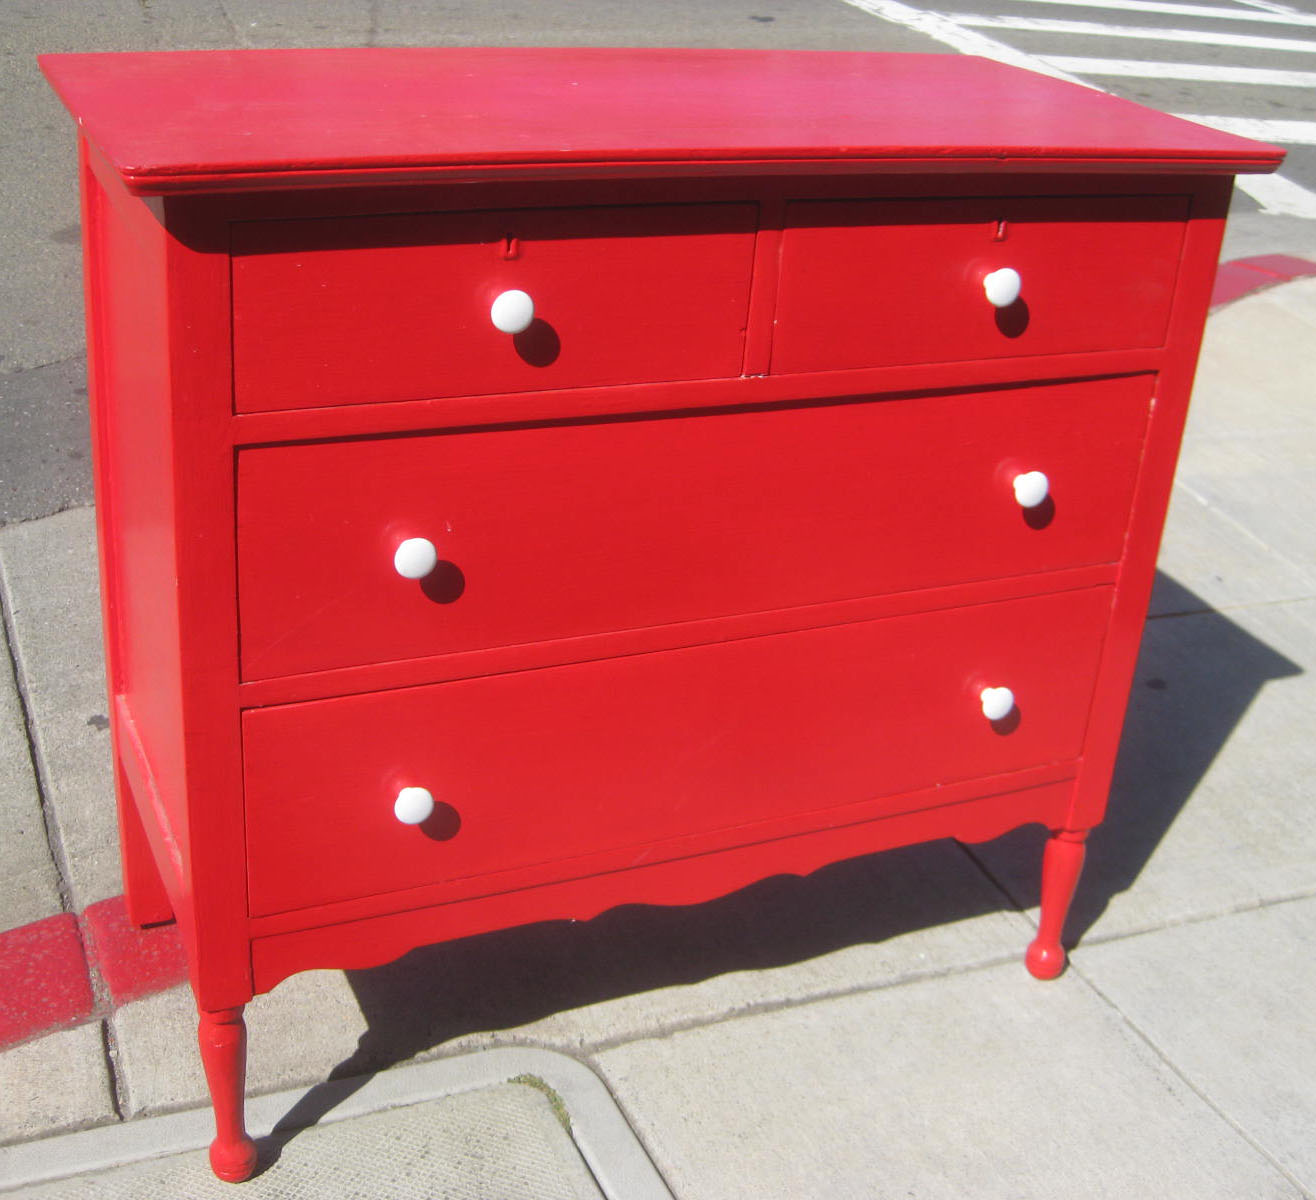 UHURU FURNITURE  COLLECTIBLES SOLD  Red Dresser  90